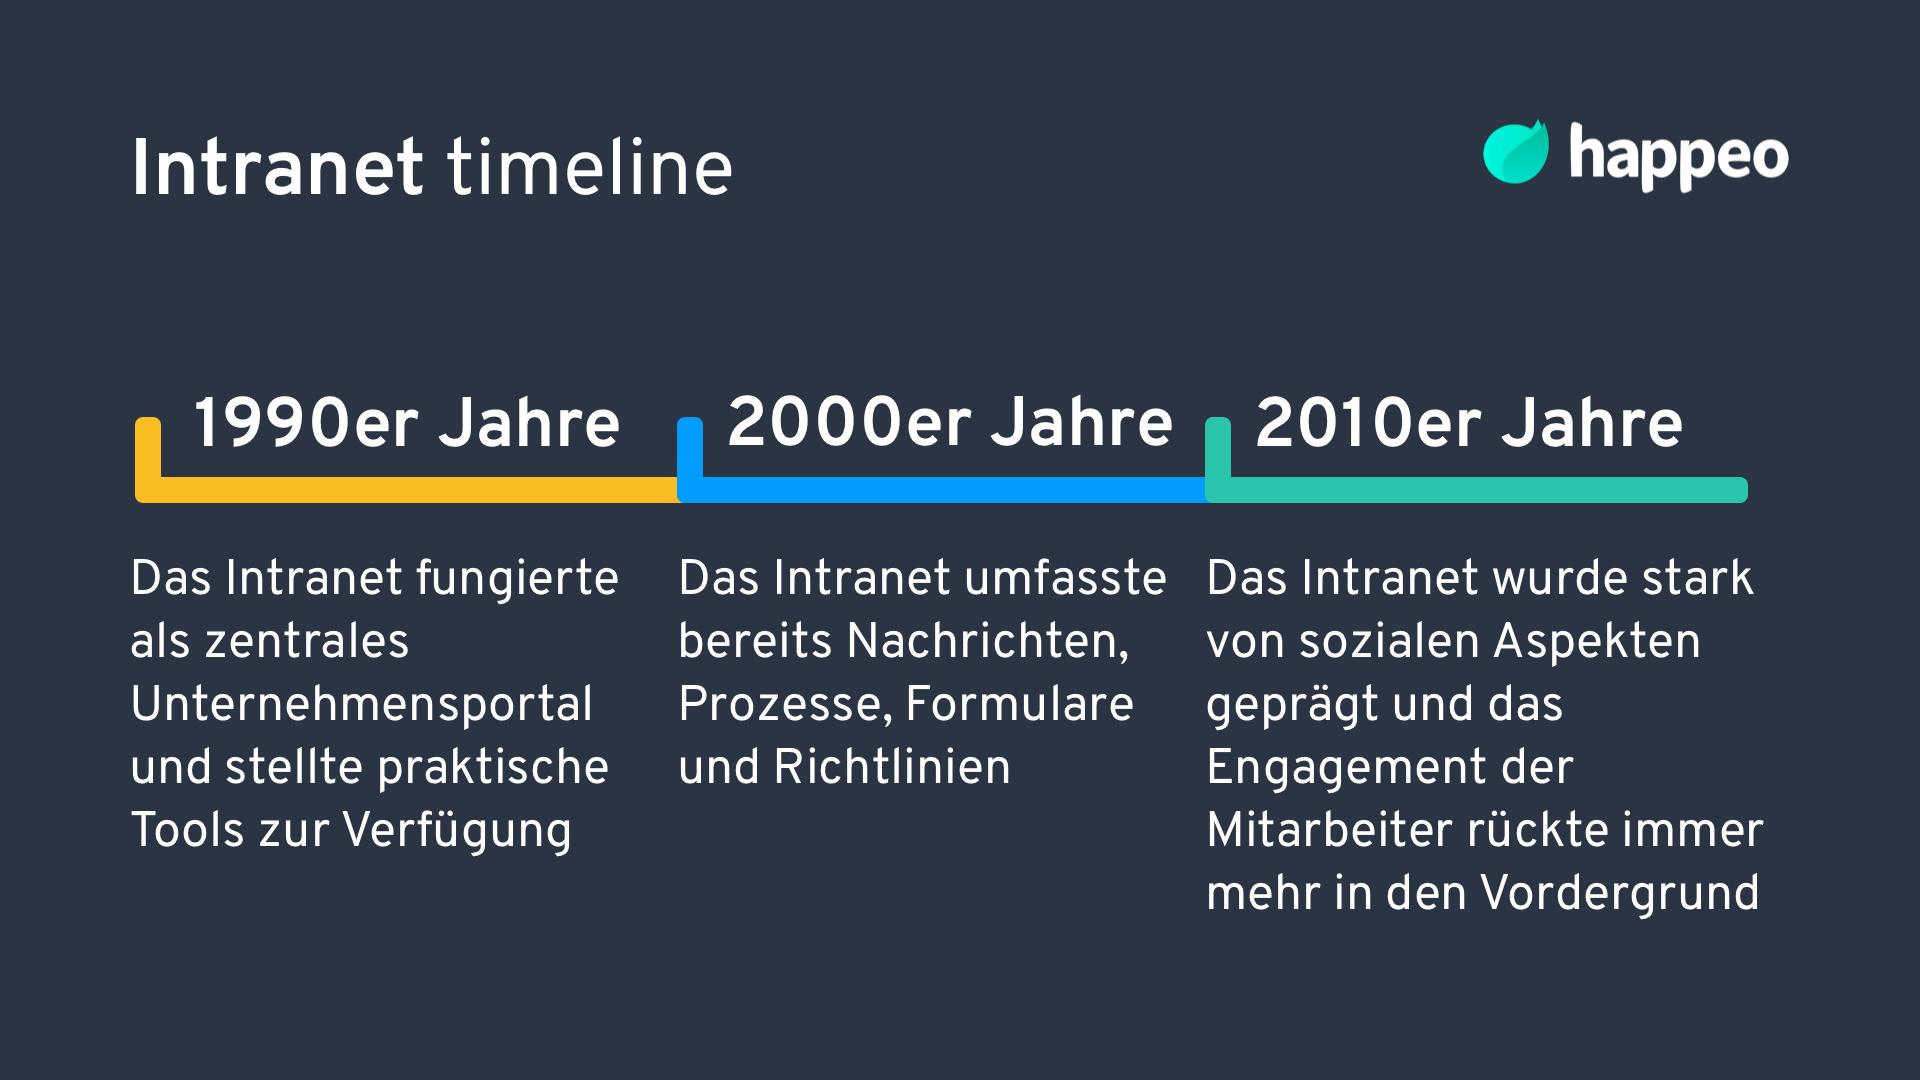 Intranet Timeline